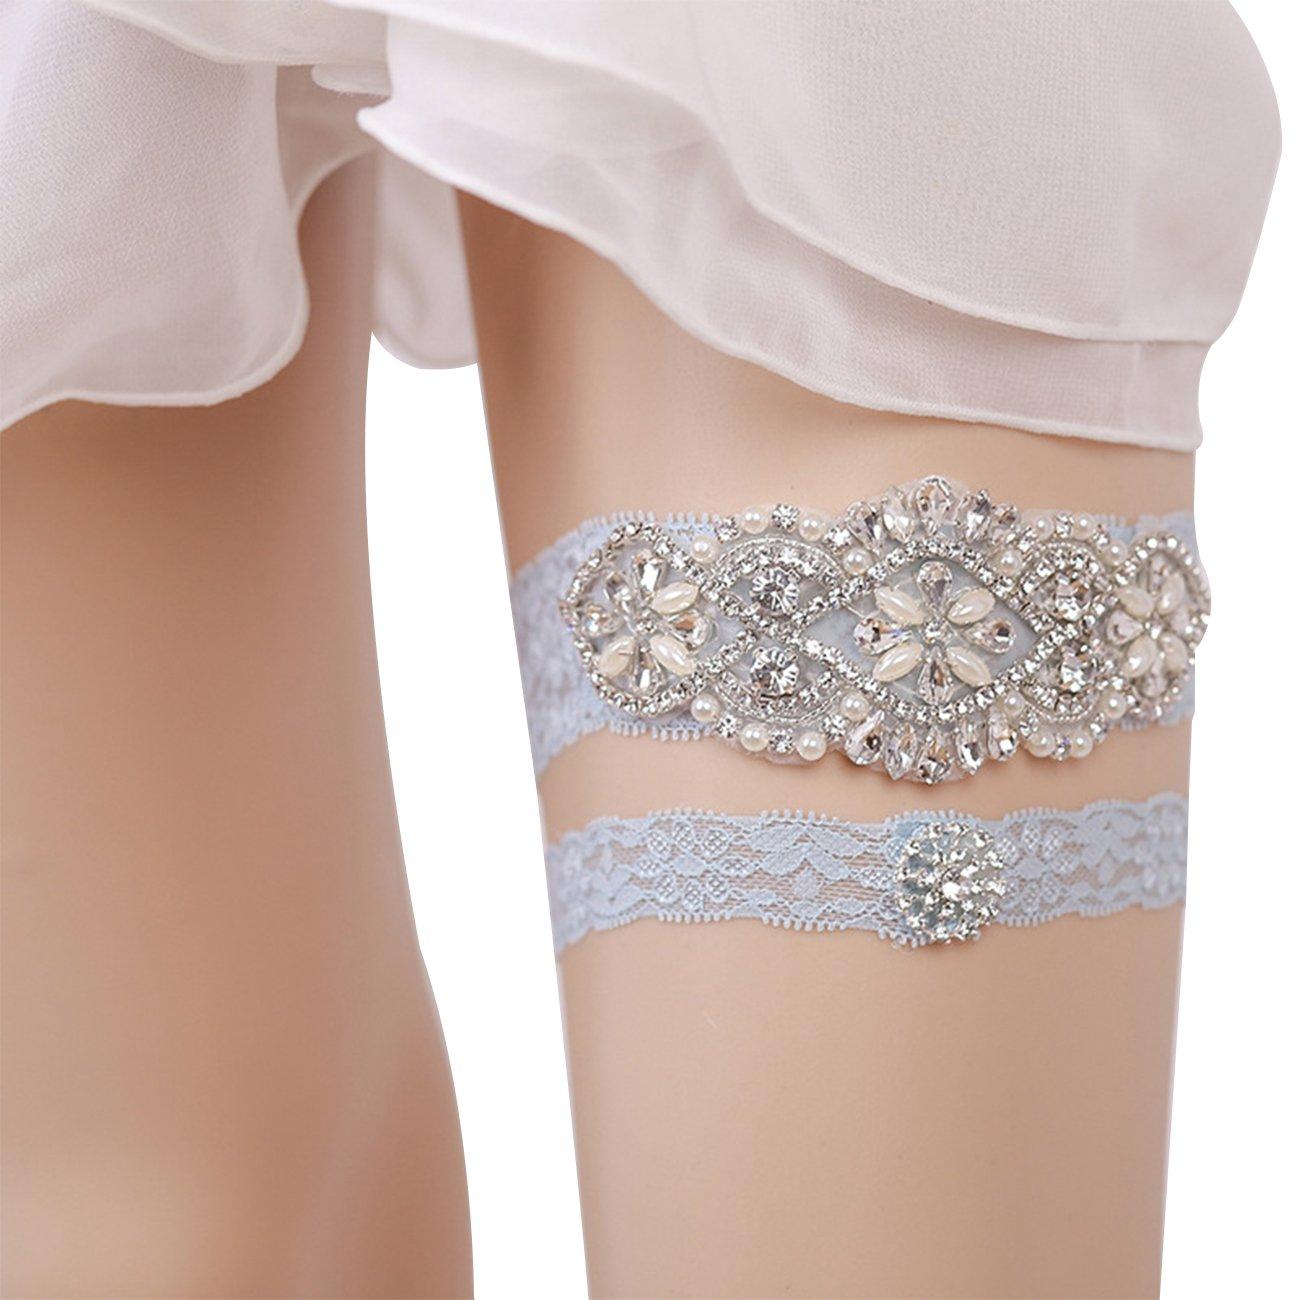 Minsto Bridal Ivory Floral Wedding Lace Retro Garters for Bride (J052)